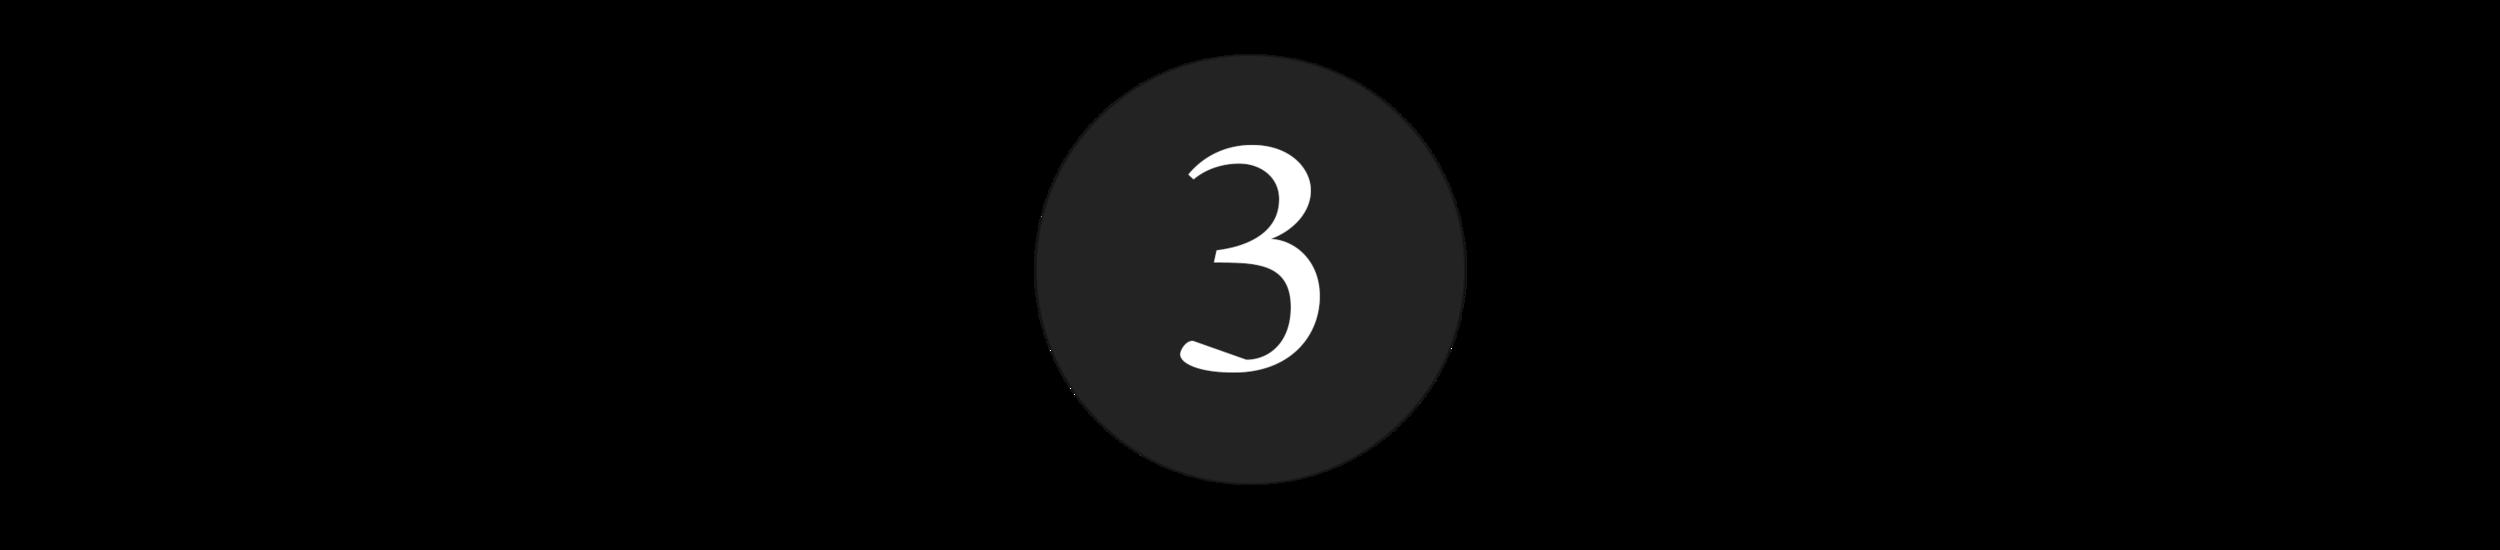 3.png